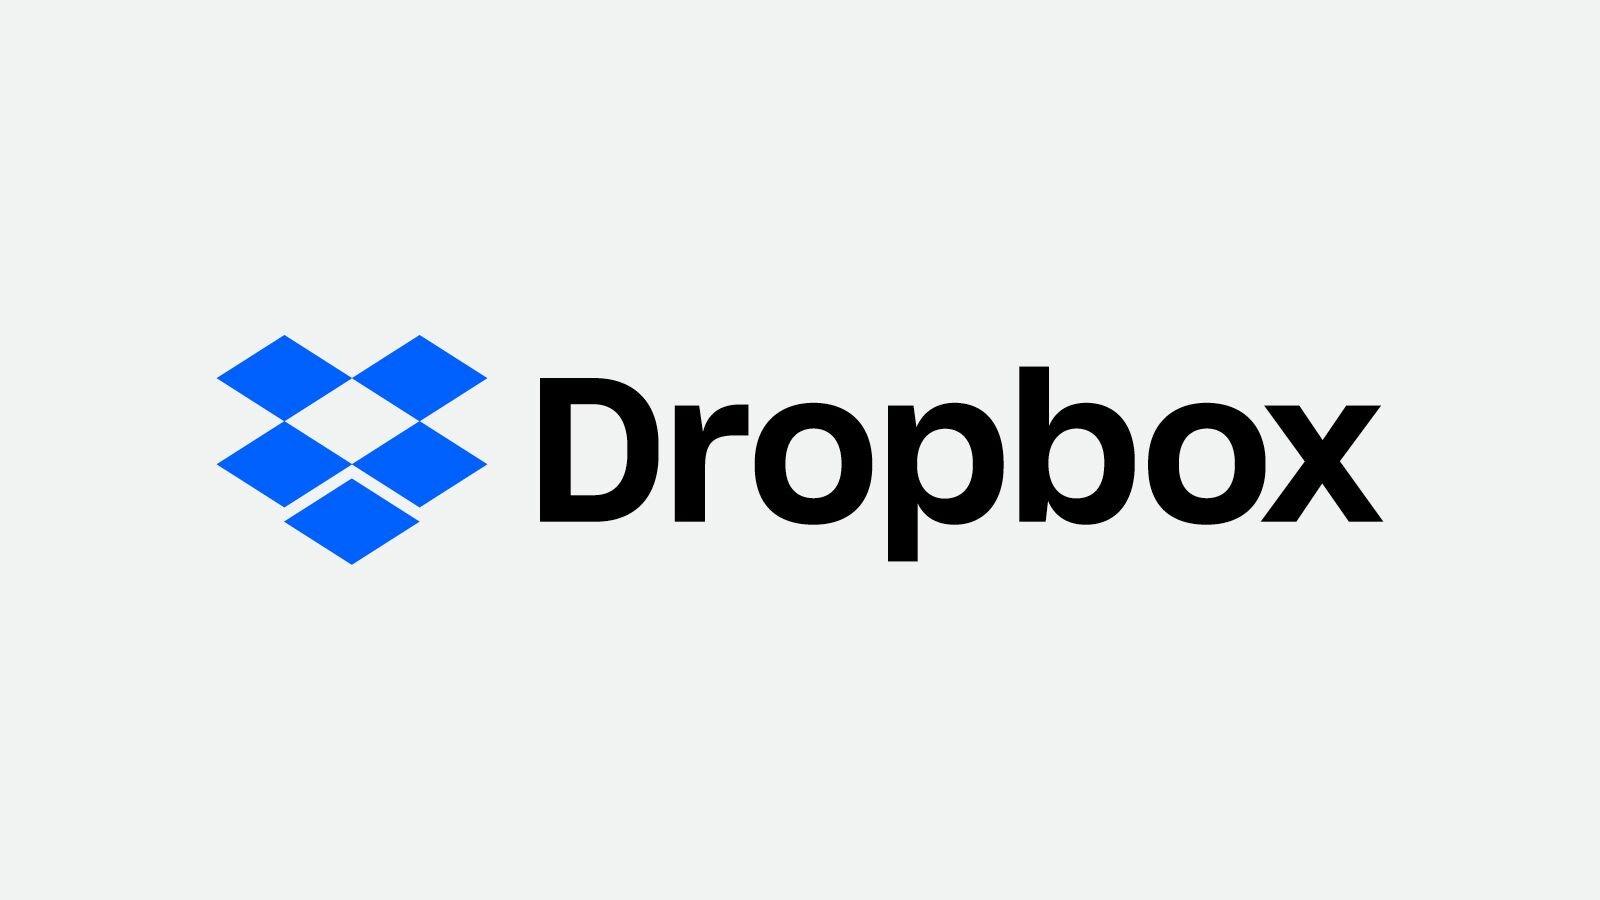 Dropbox и пандемия коронавируса